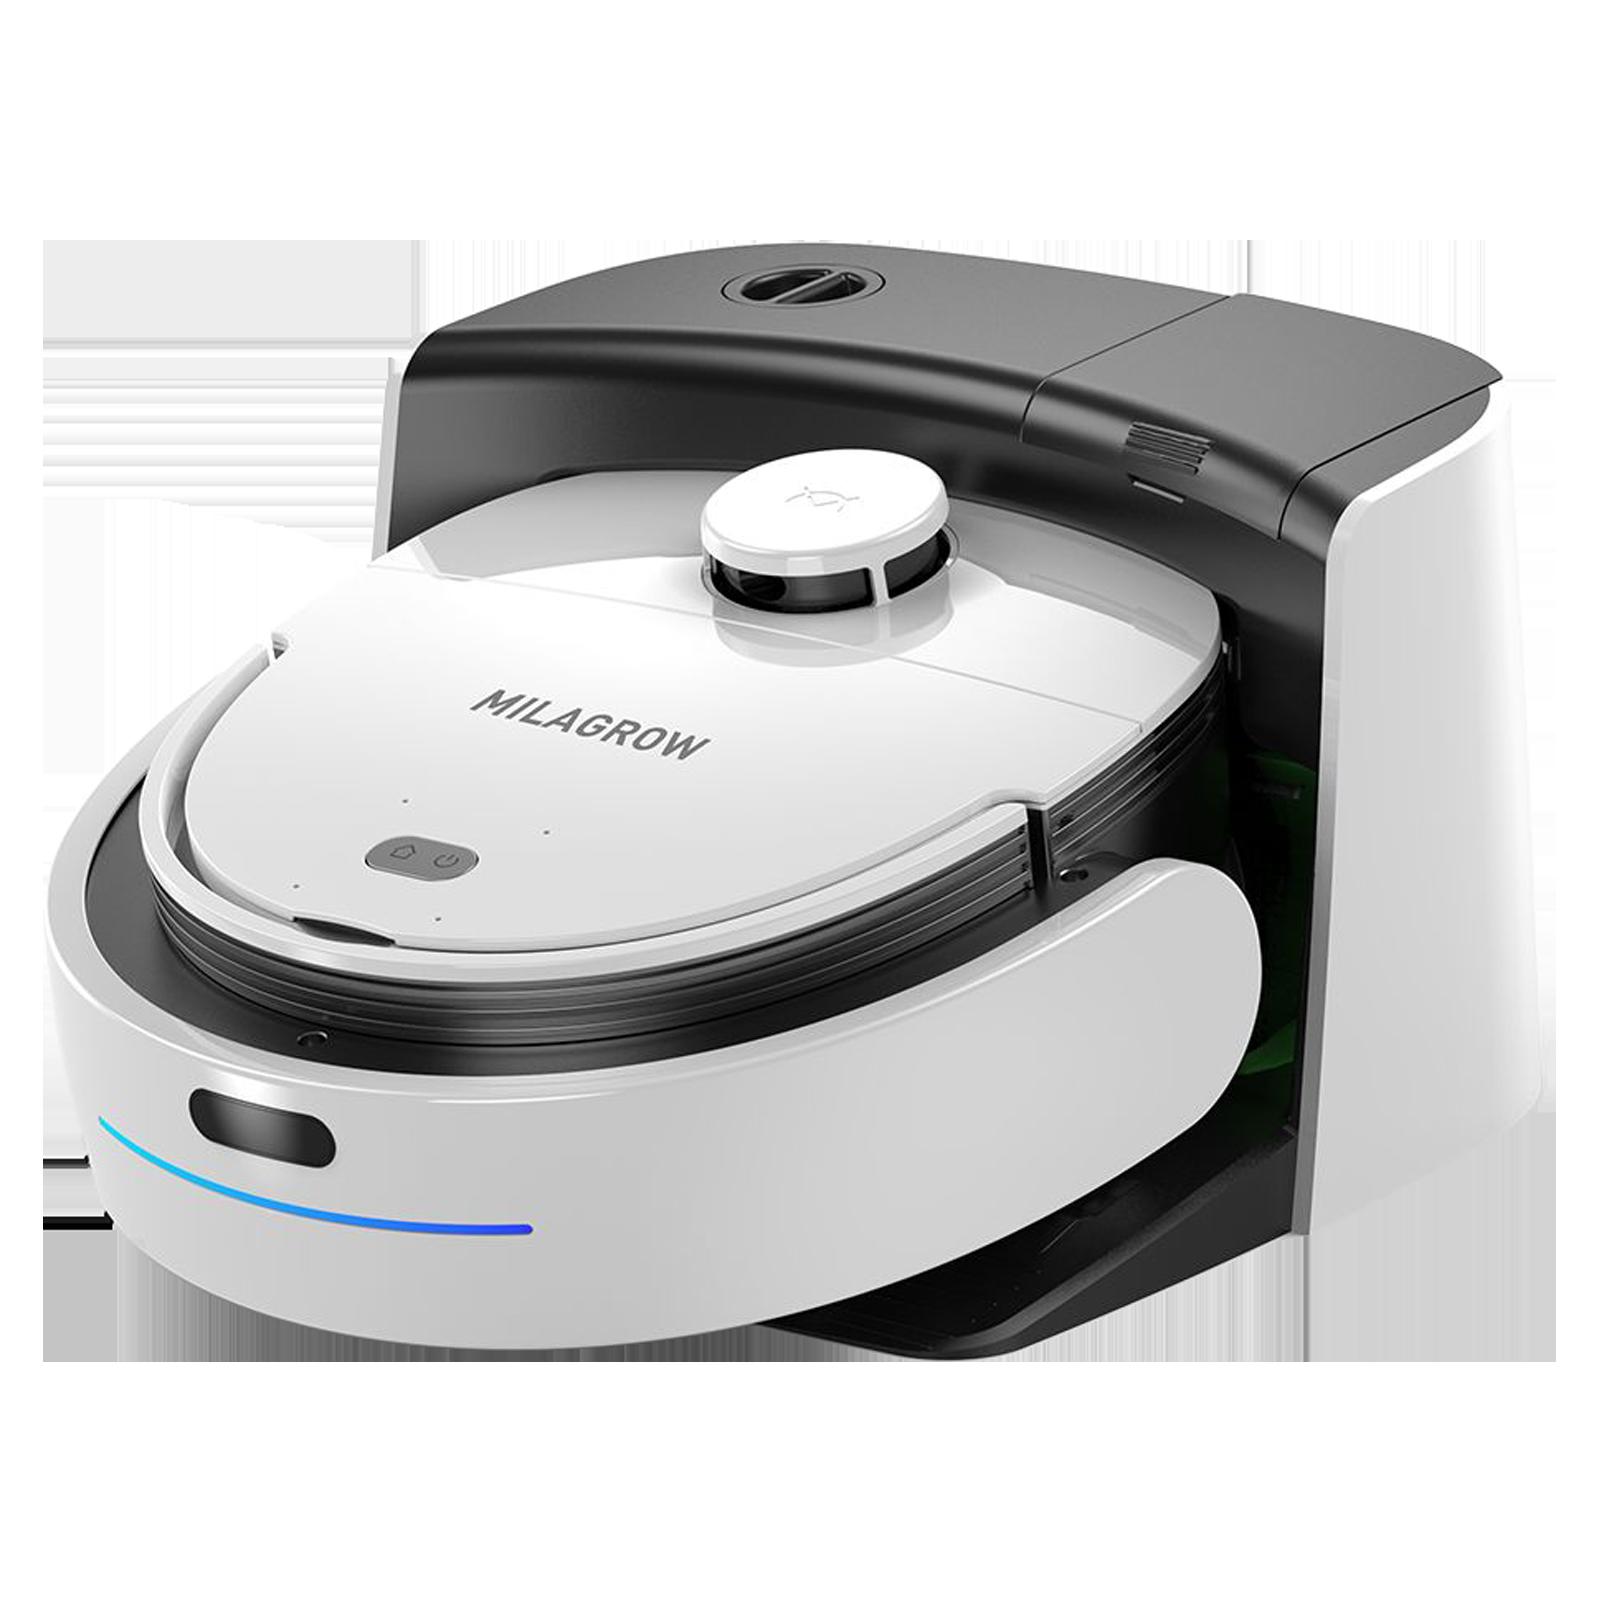 Milagrow IMap Max Zip 55 Watts Robotic Vacuum Cleaner (1 Litres Tank, White)_1